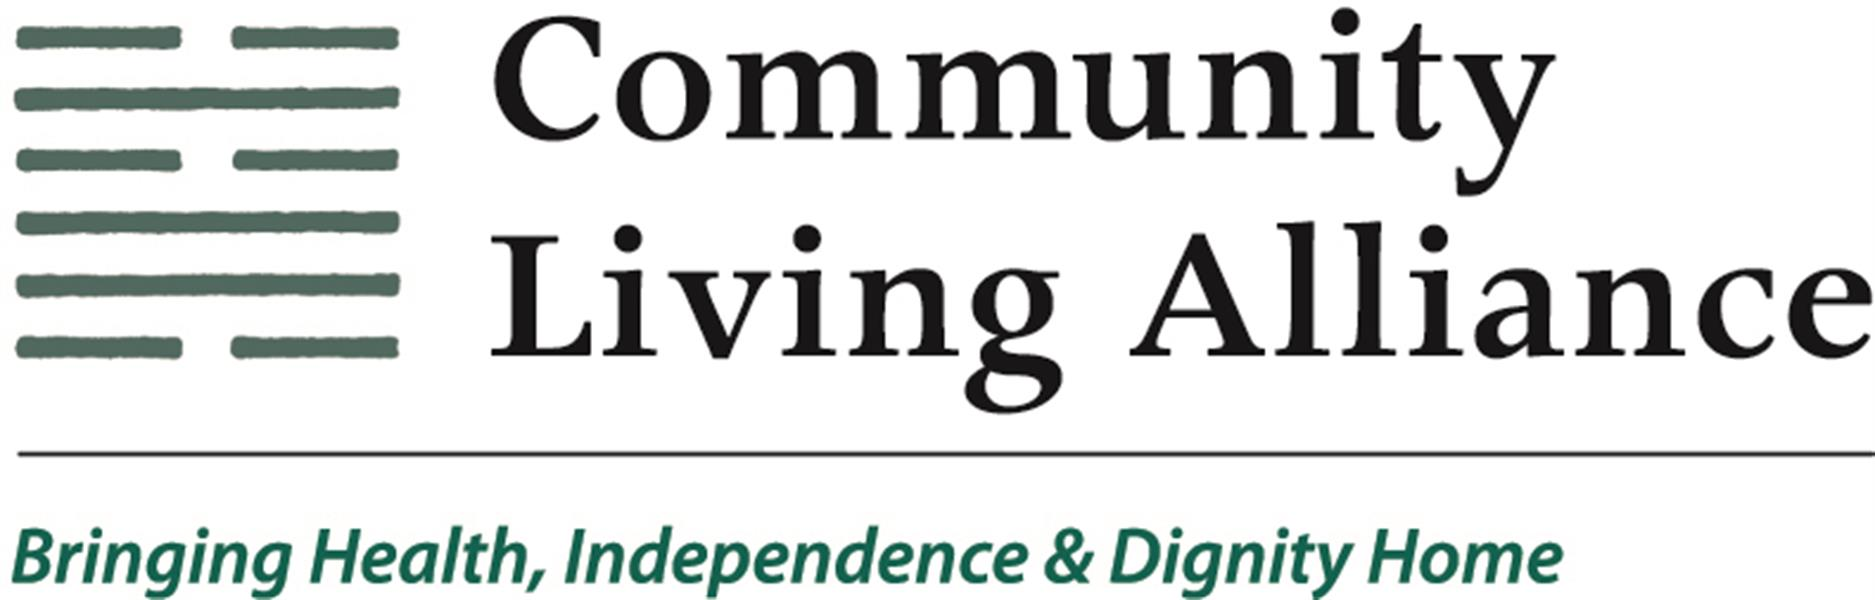 Community Living Alliance